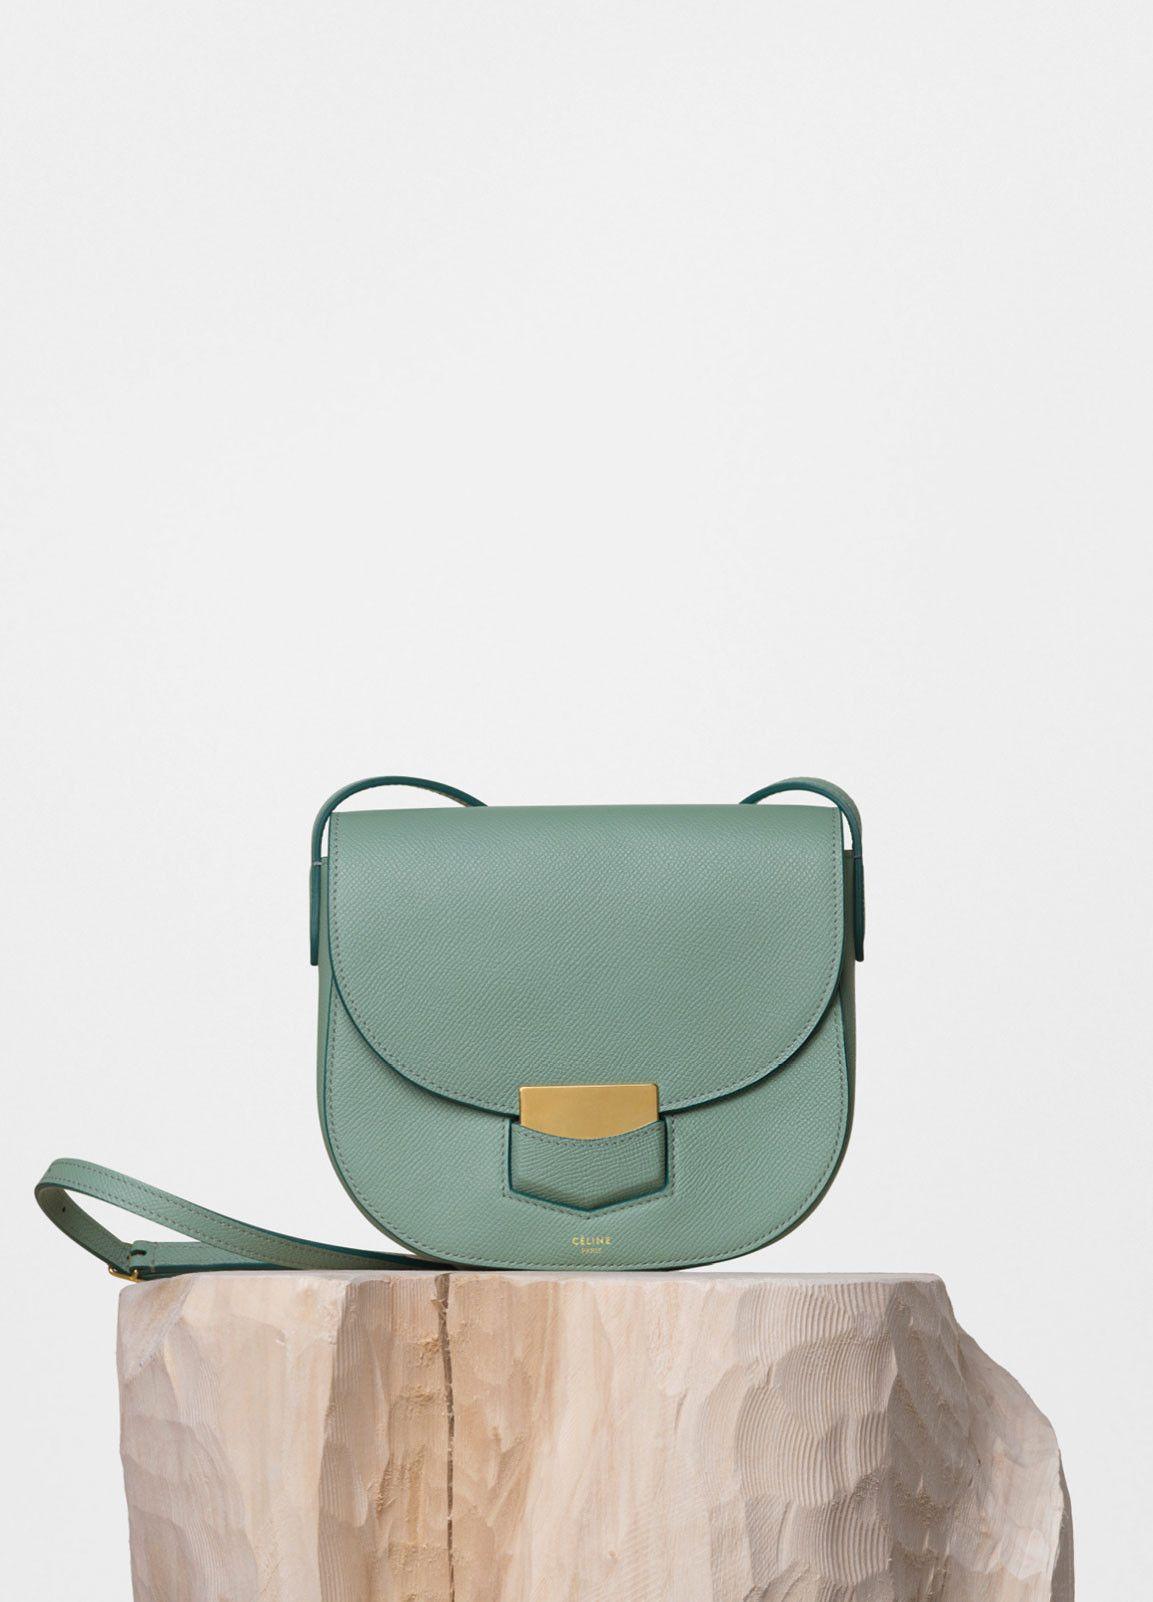 ac598a625 Small Trotteur Bag in Grained Calfskin - Céline | Womens Bag ...